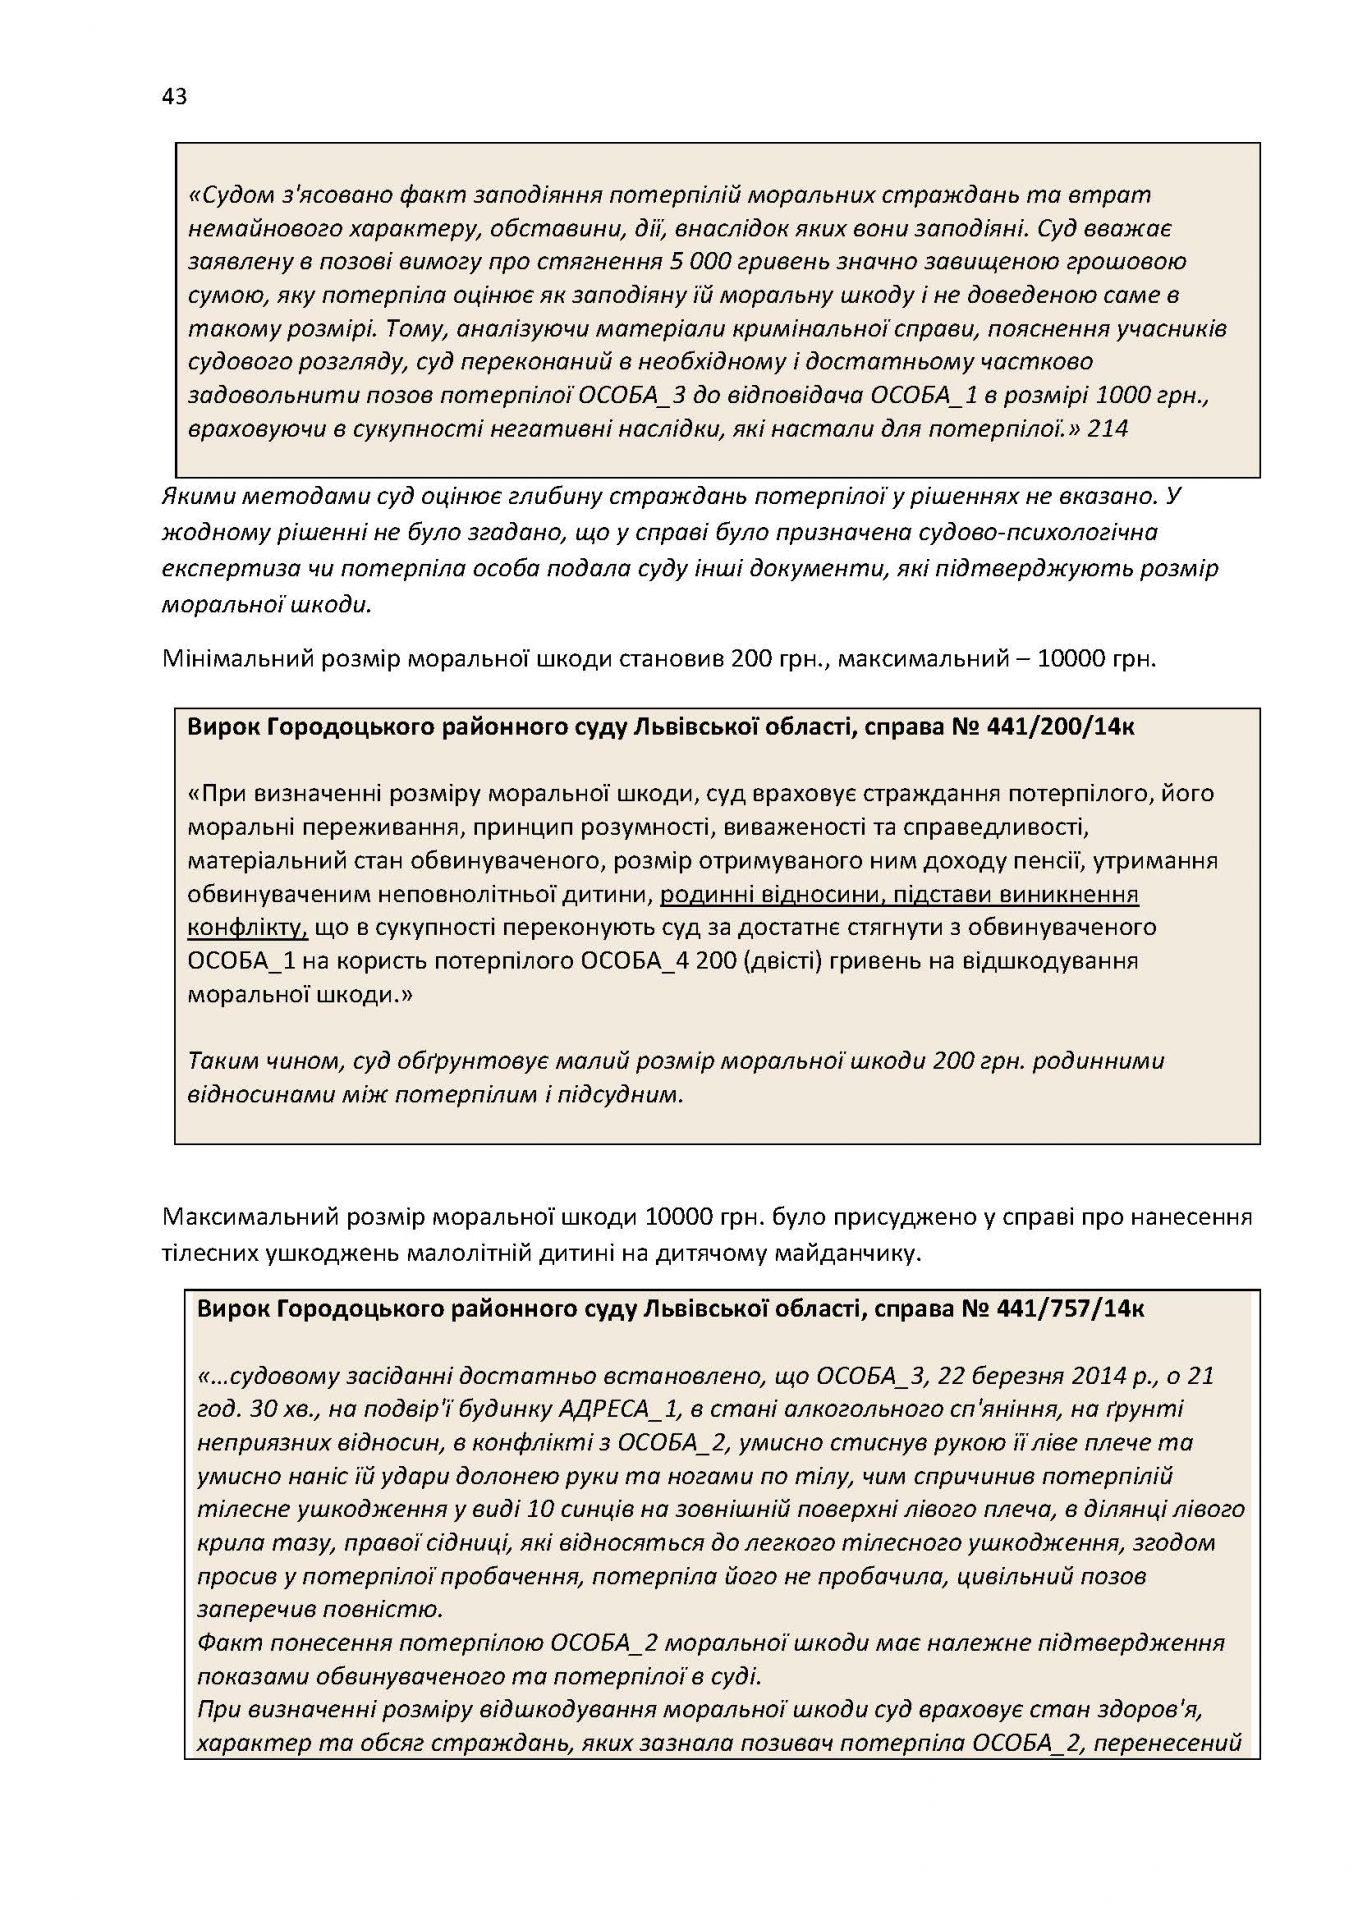 Draft Report monitoring print USAID_Страница_43